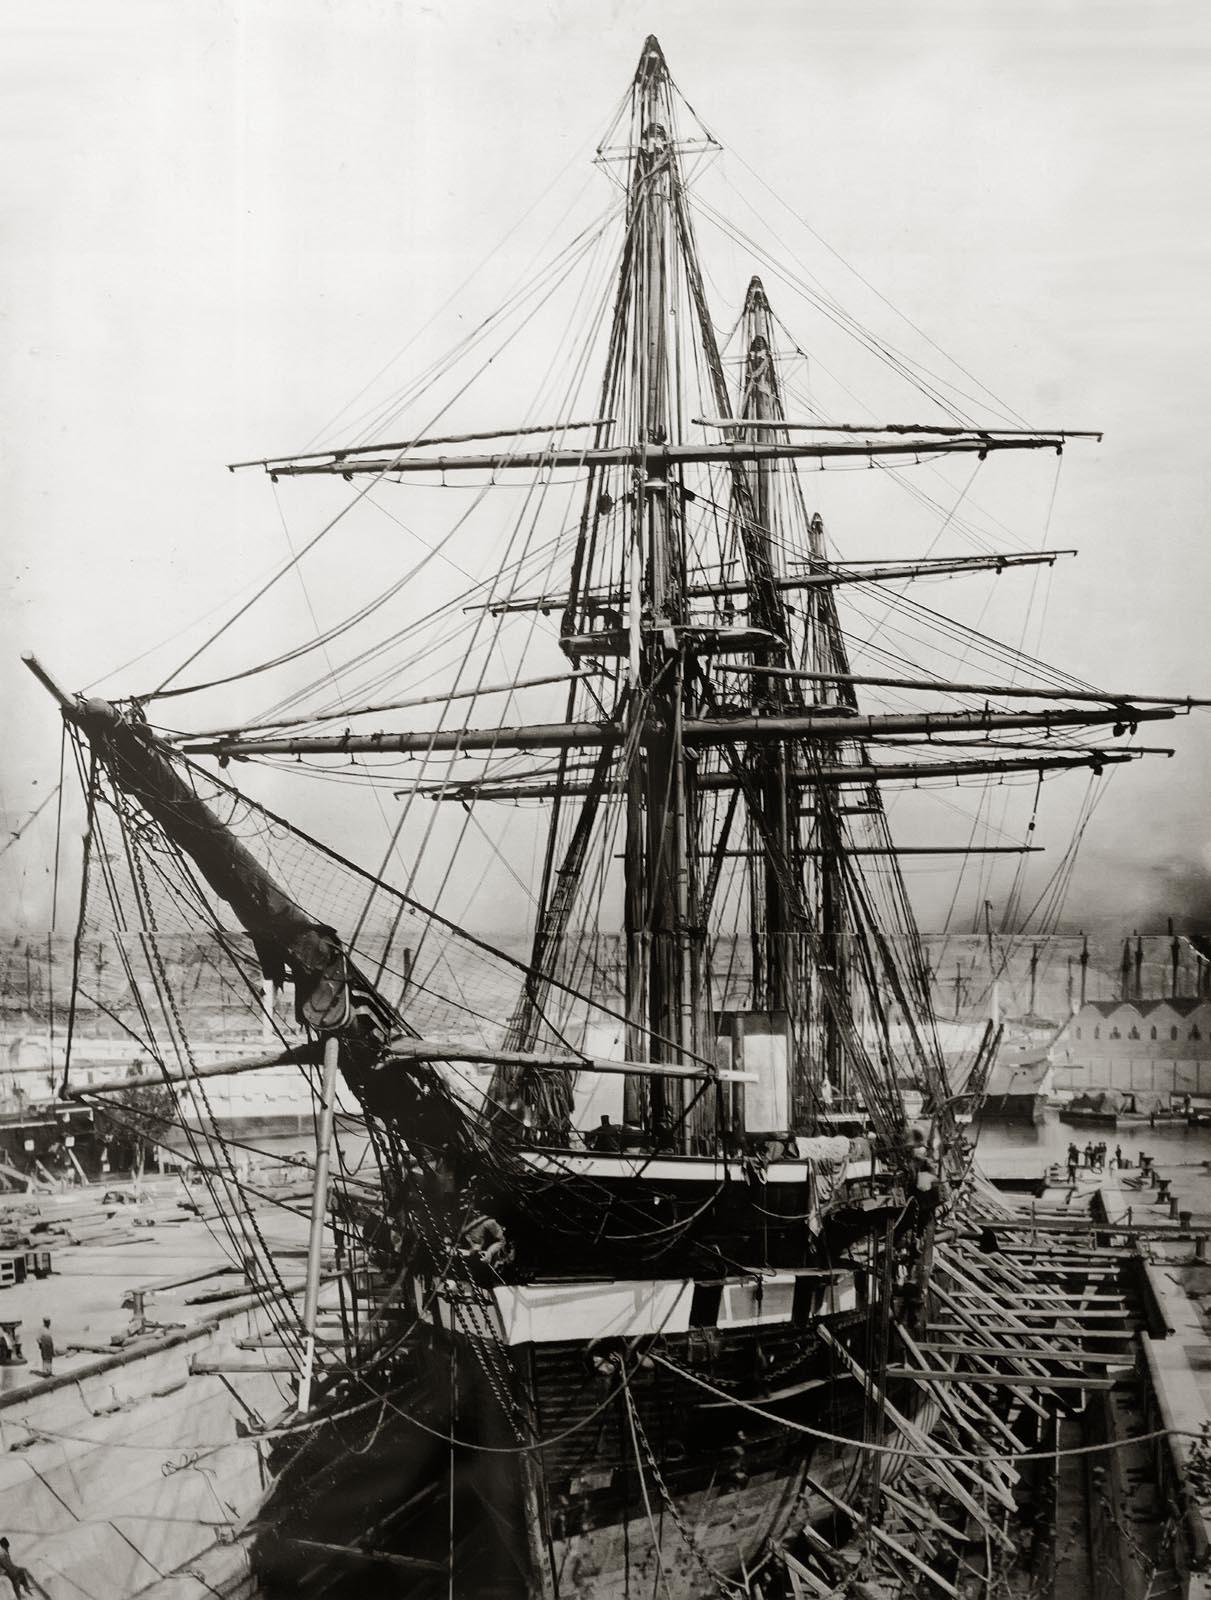 Фото №750868. Винтовой фрегат «Александр Невский» в доке. фото 1860-х